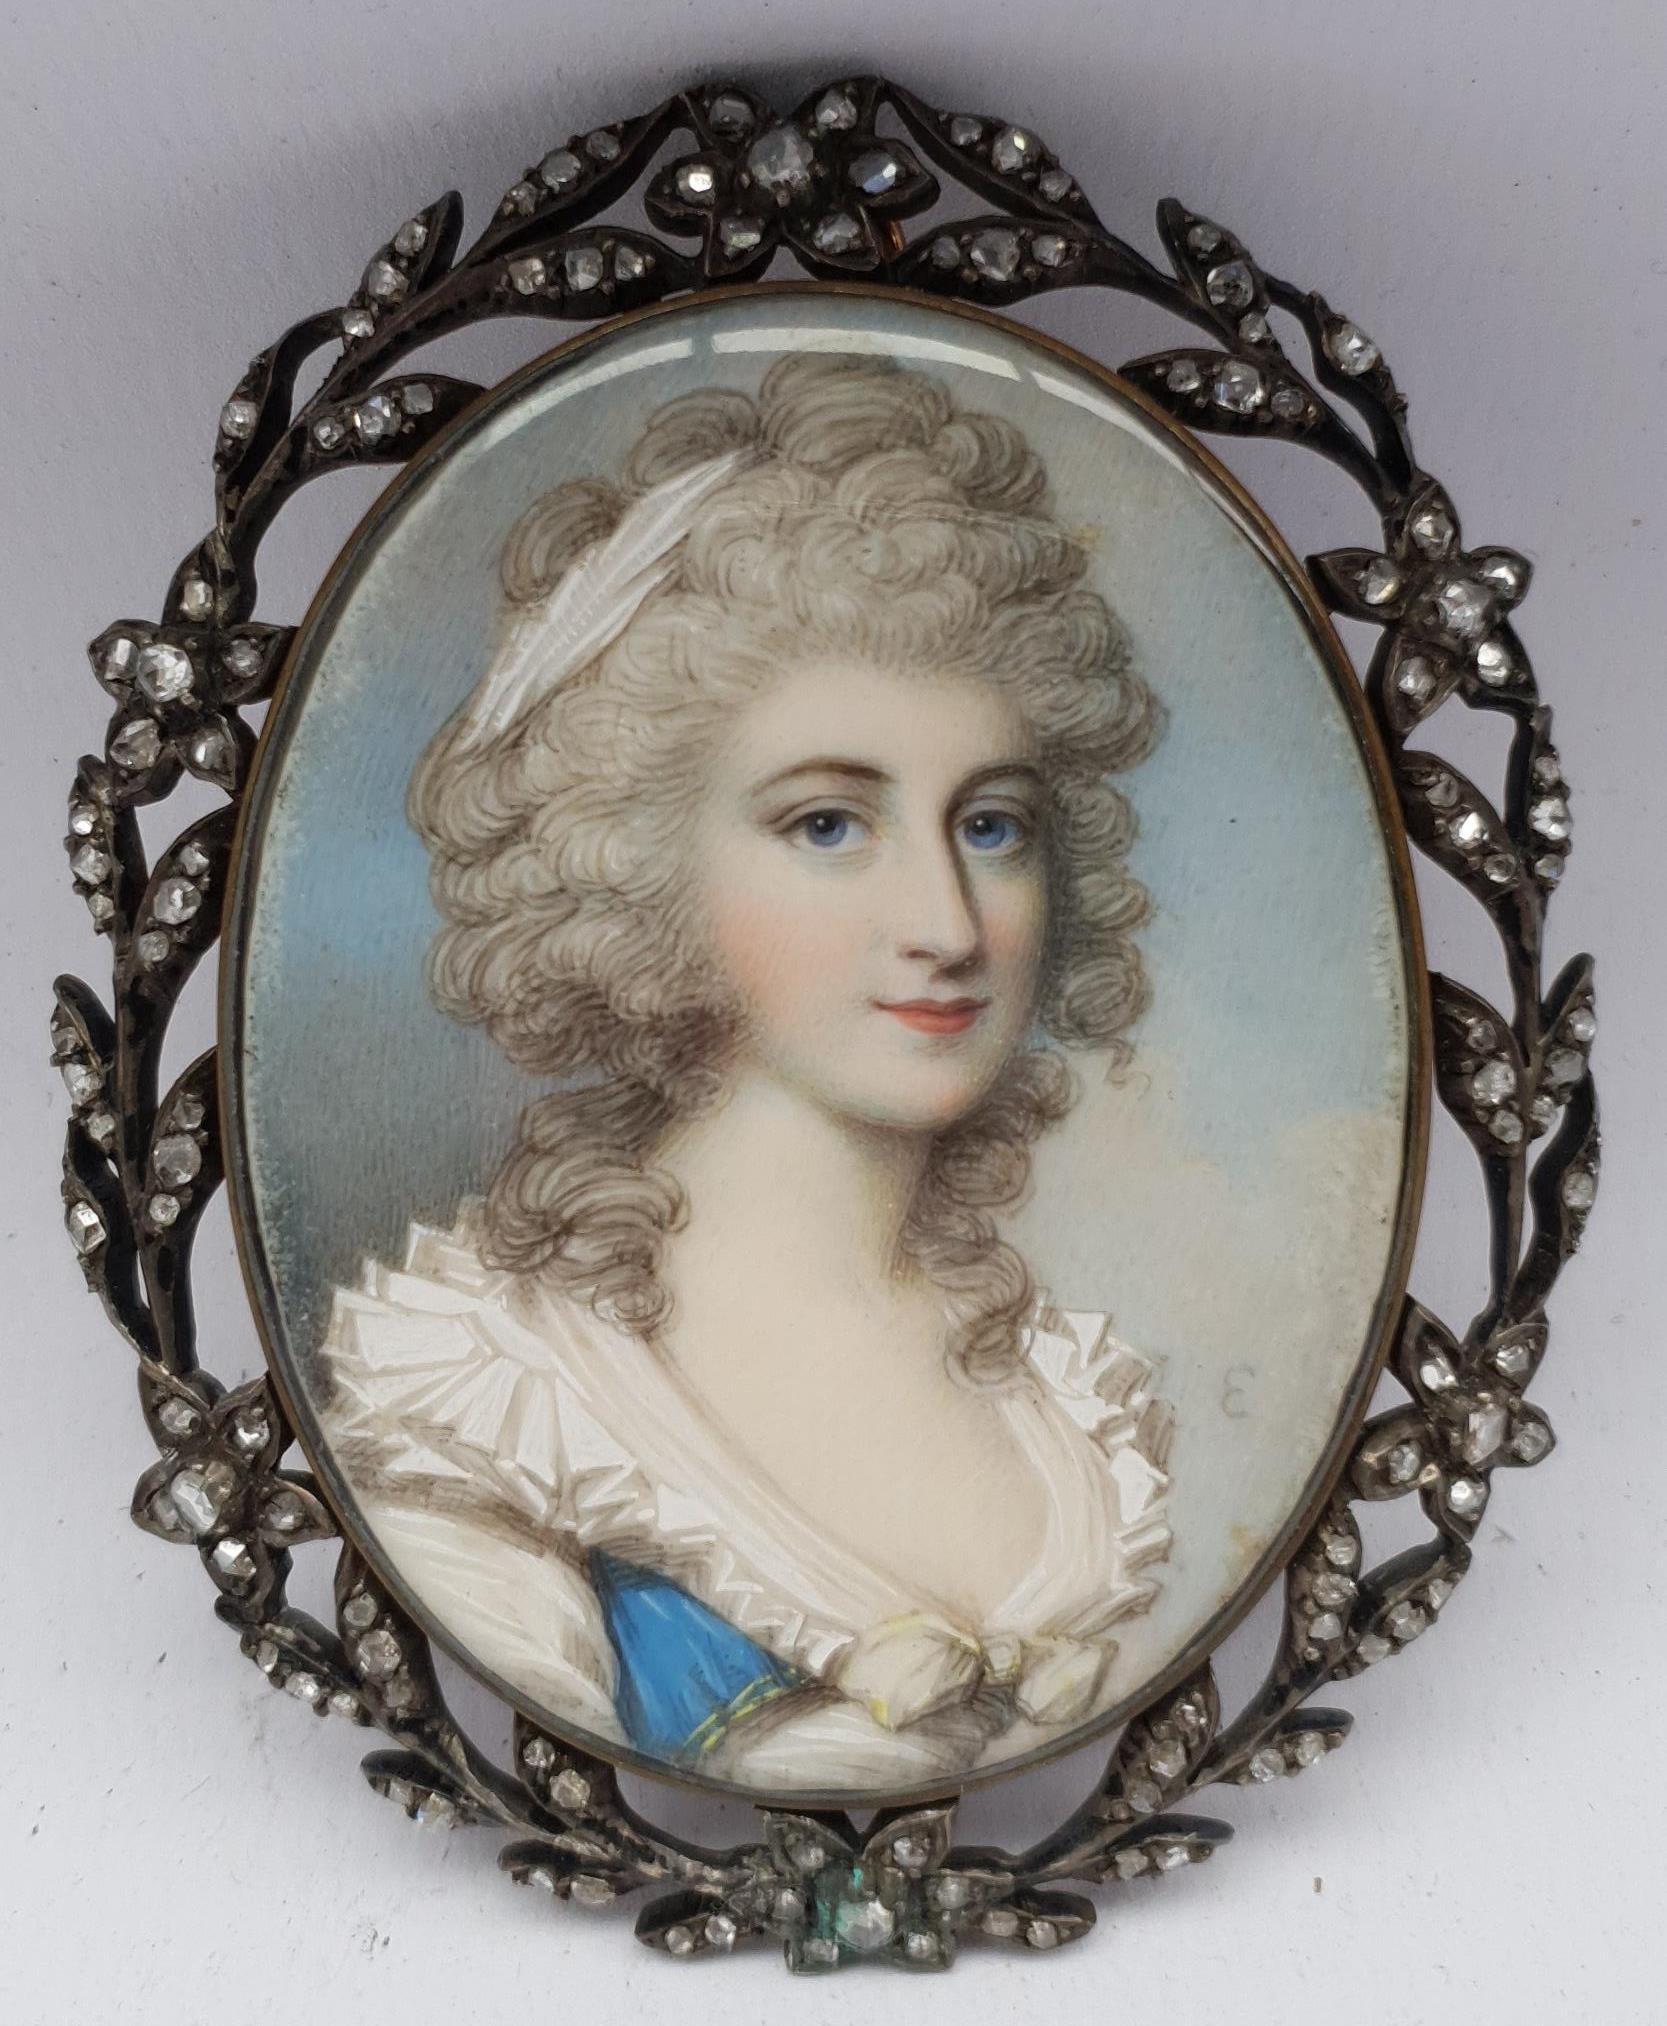 Attrib. George Engleheart (British 1750-1829): Lady in a Powdered Wig and White Dress, portrait mini